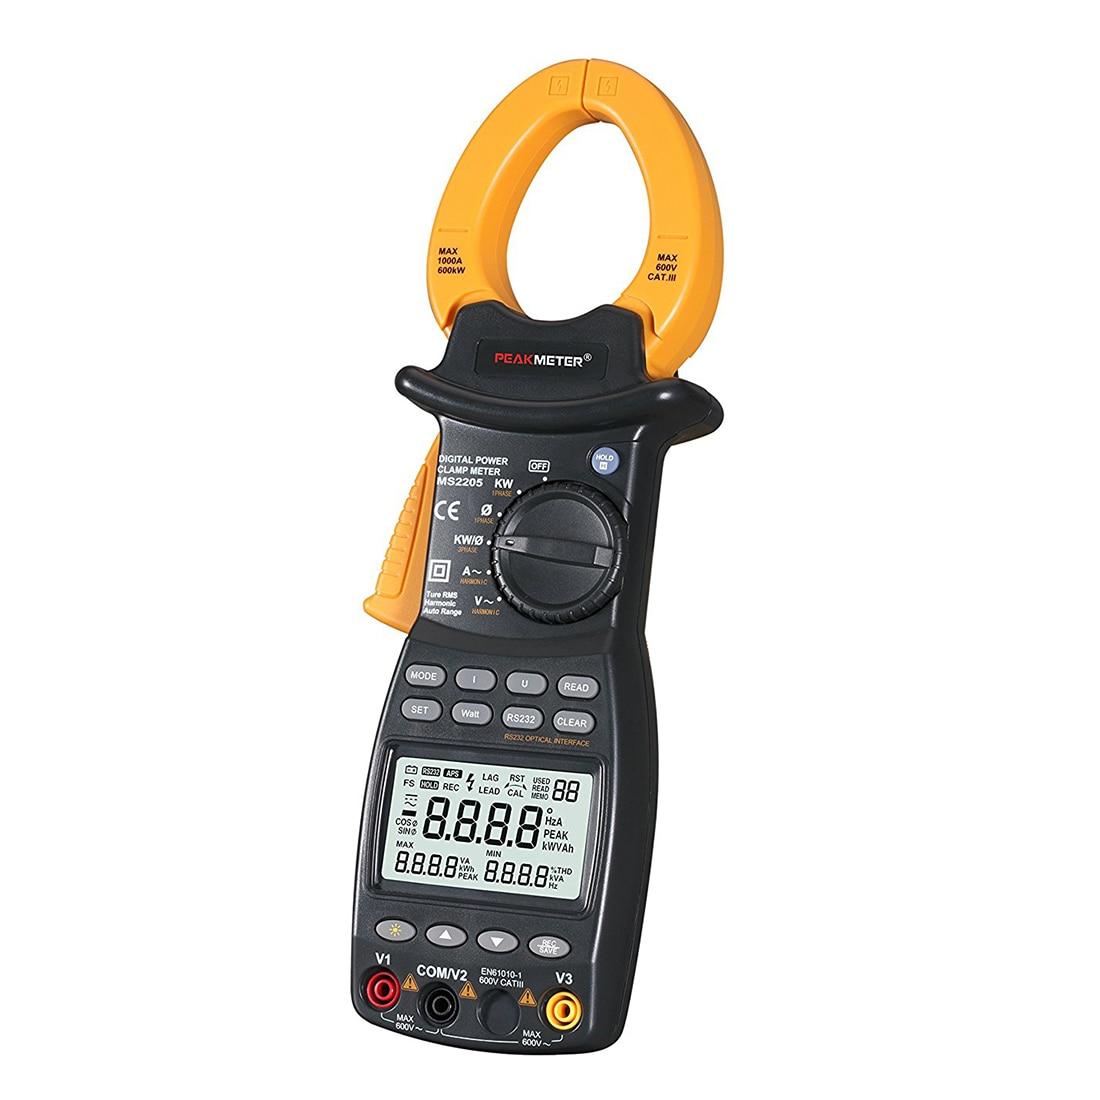 PEAKMETER MS2205 9999 Counts Auto Range Power-off AC Digital Power Clamp Meter Multimeter AC DC Voltage Current Active Apparen zipabox power current clamp 35a